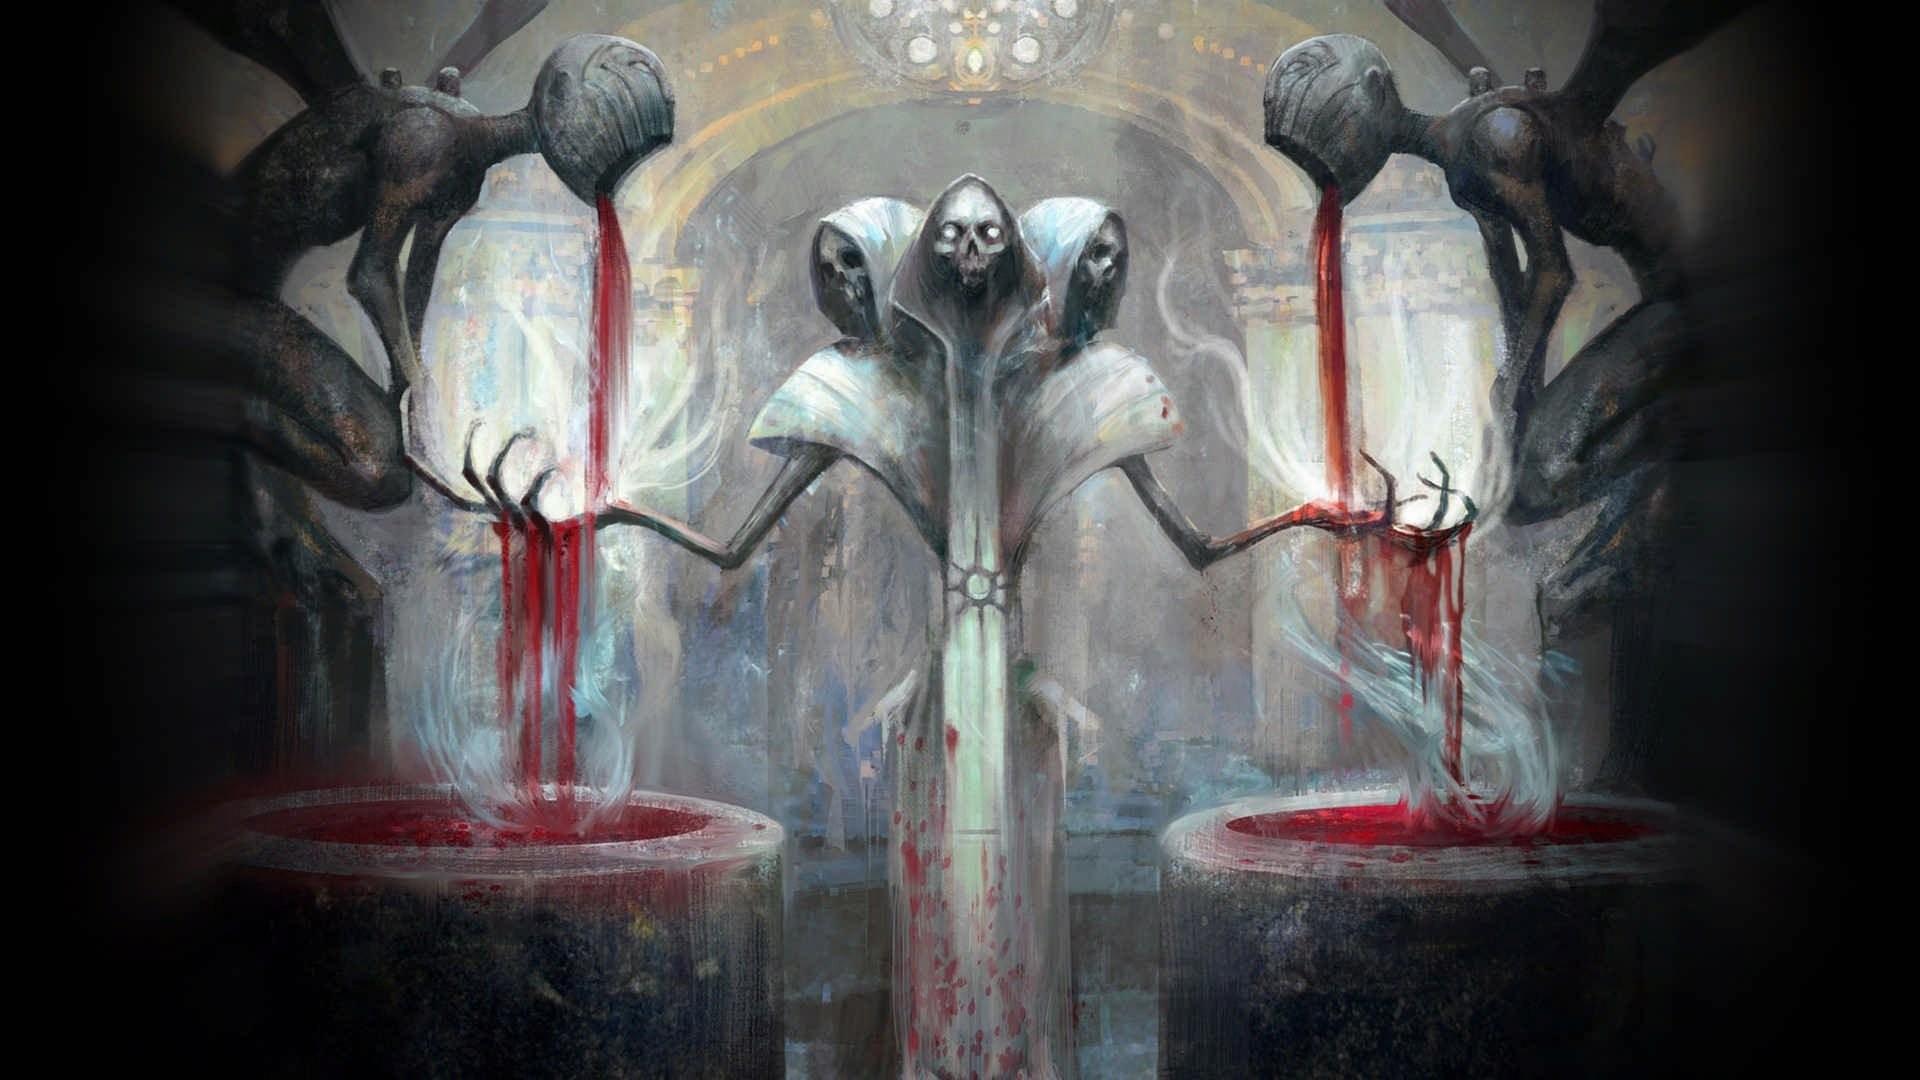 wallpaper : 1920x1080 px, blood, creepy, death, devils, digital art